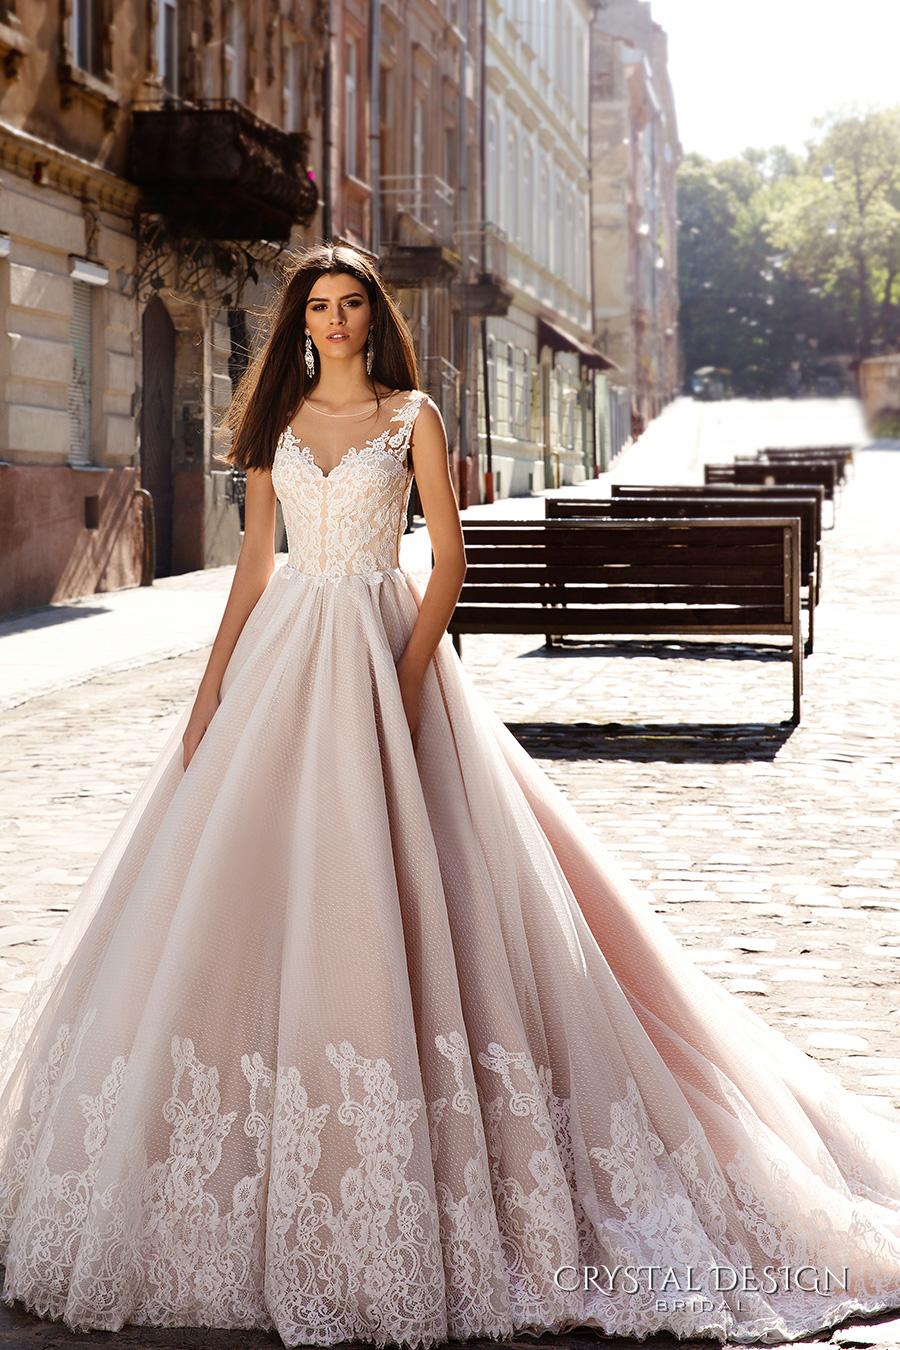 crystal mermaid wedding dress uk swarovski wedding dress White Crystal Mermaid Wedding Dresses With Sweetheart Satin